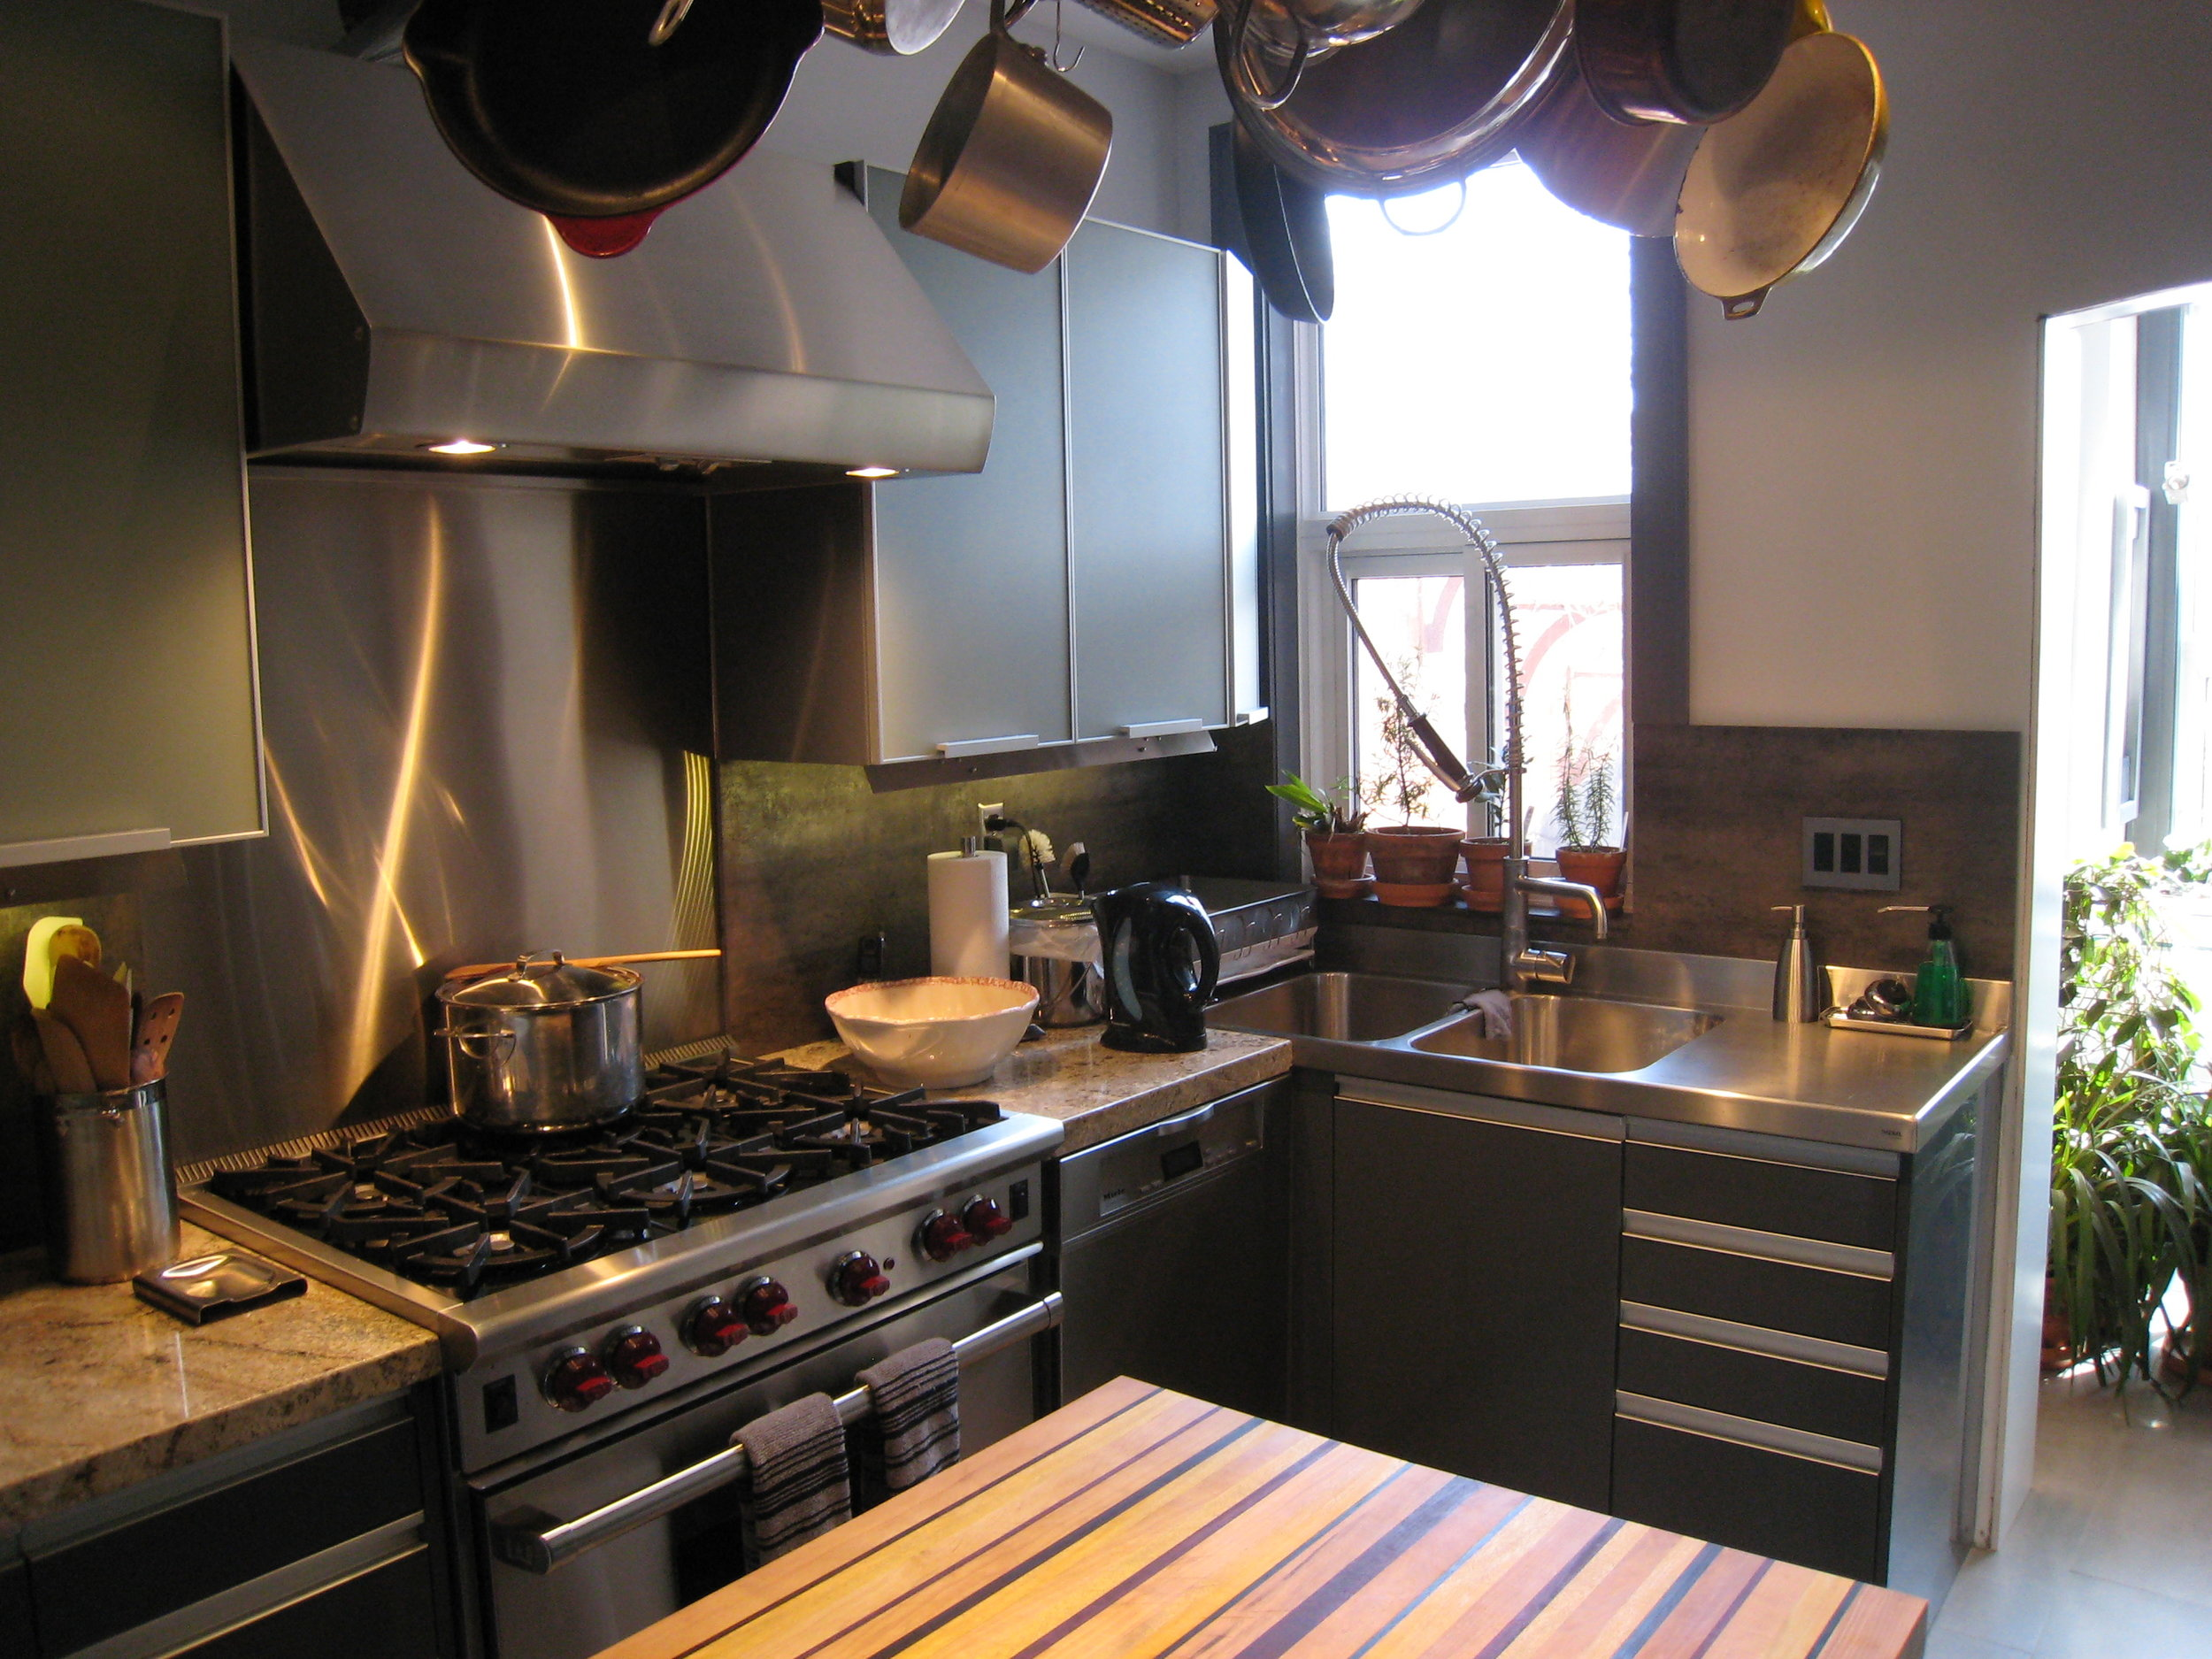 Kitchen 11 Pic 1.JPG